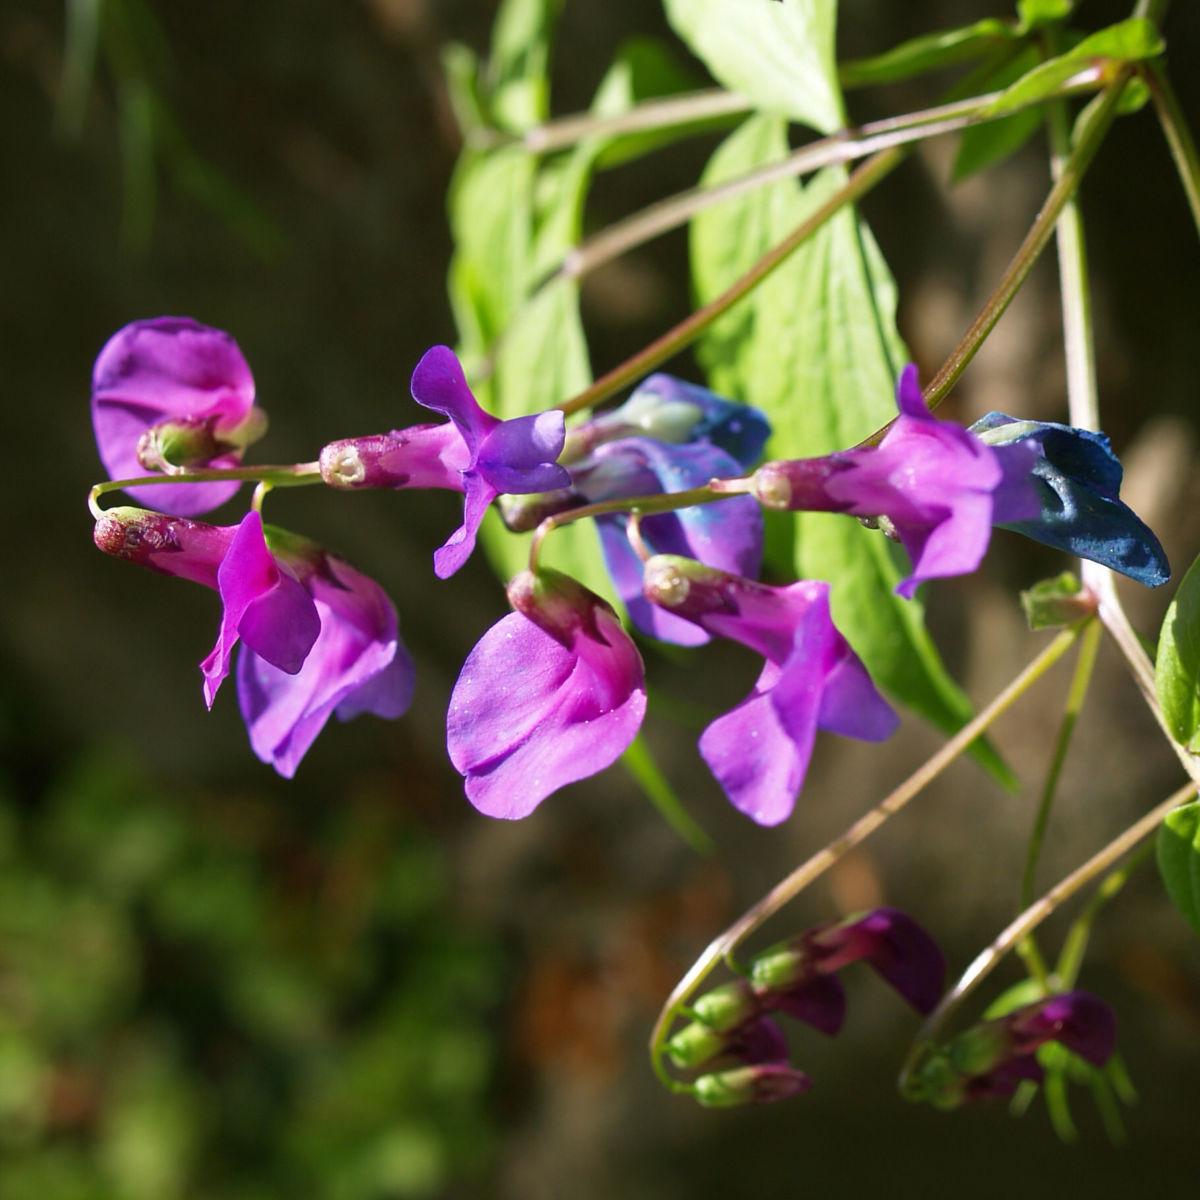 Fruelings Platterbse Bluete violett Lathyrus vernus